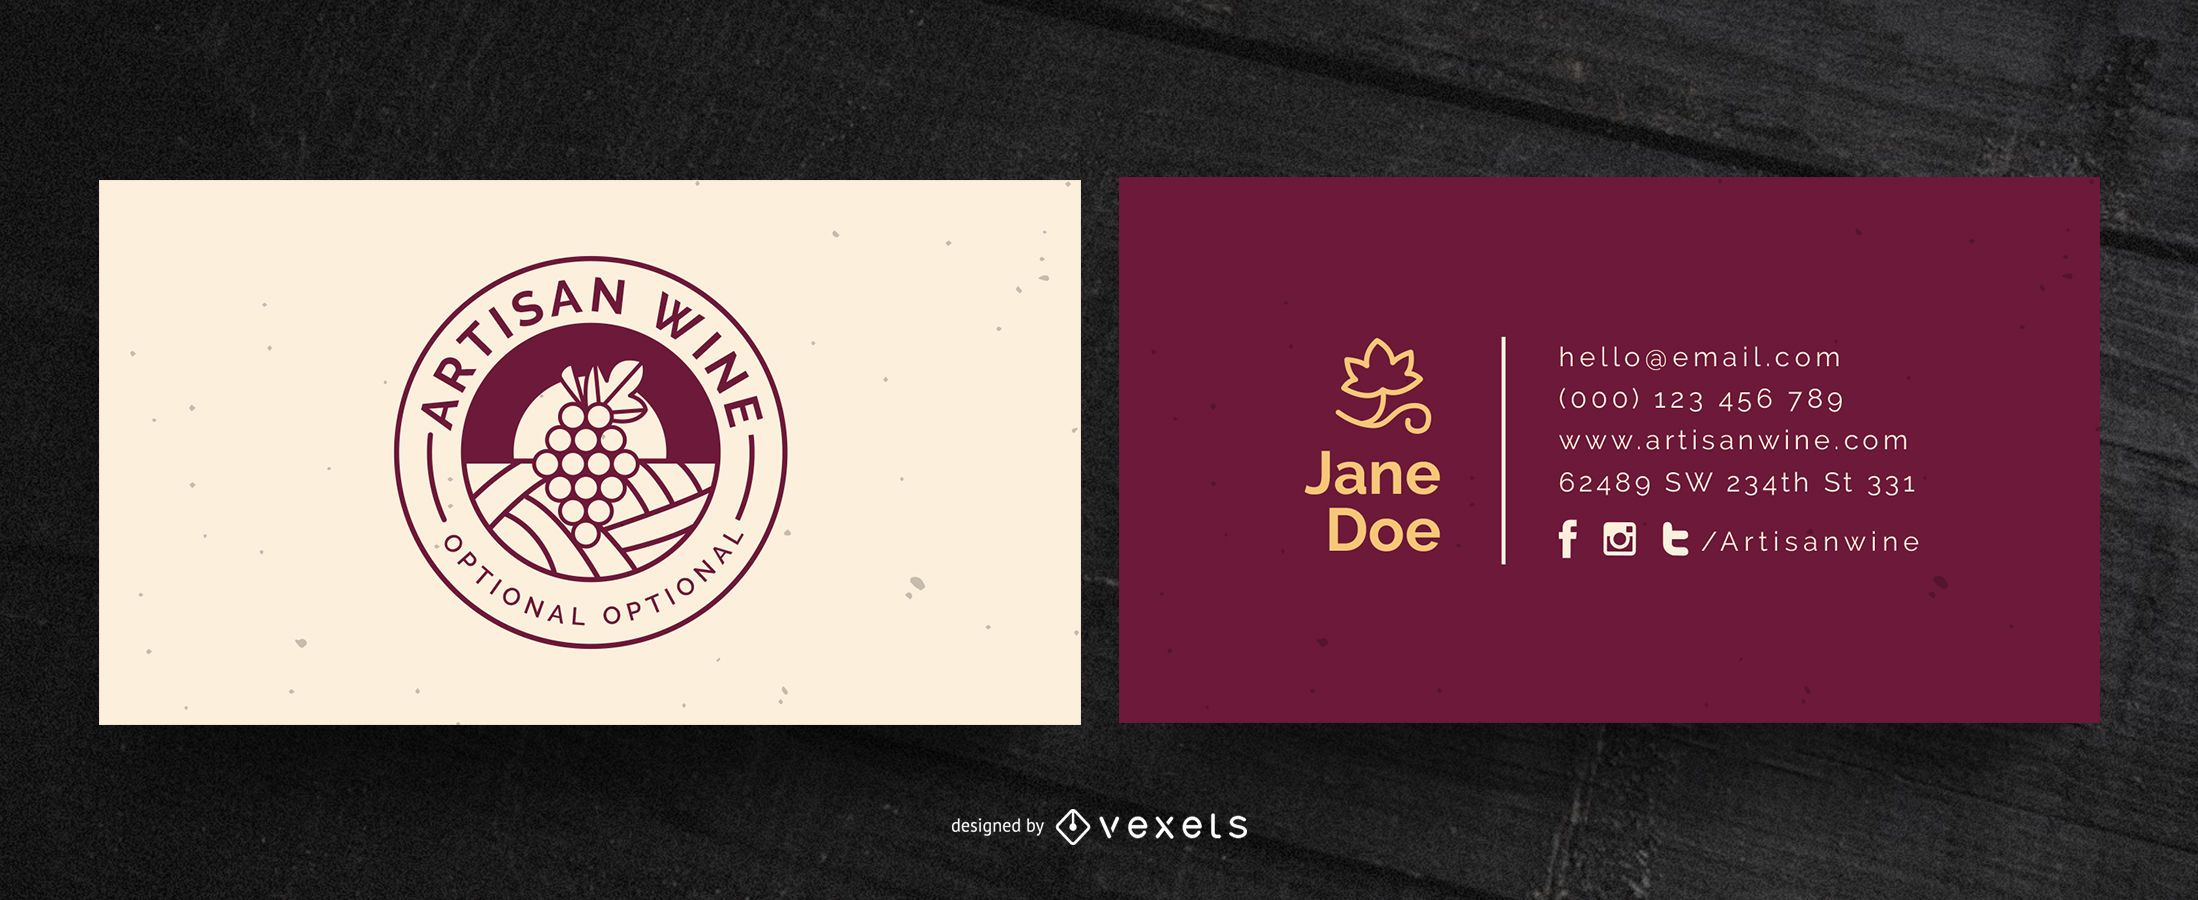 Wine business card design